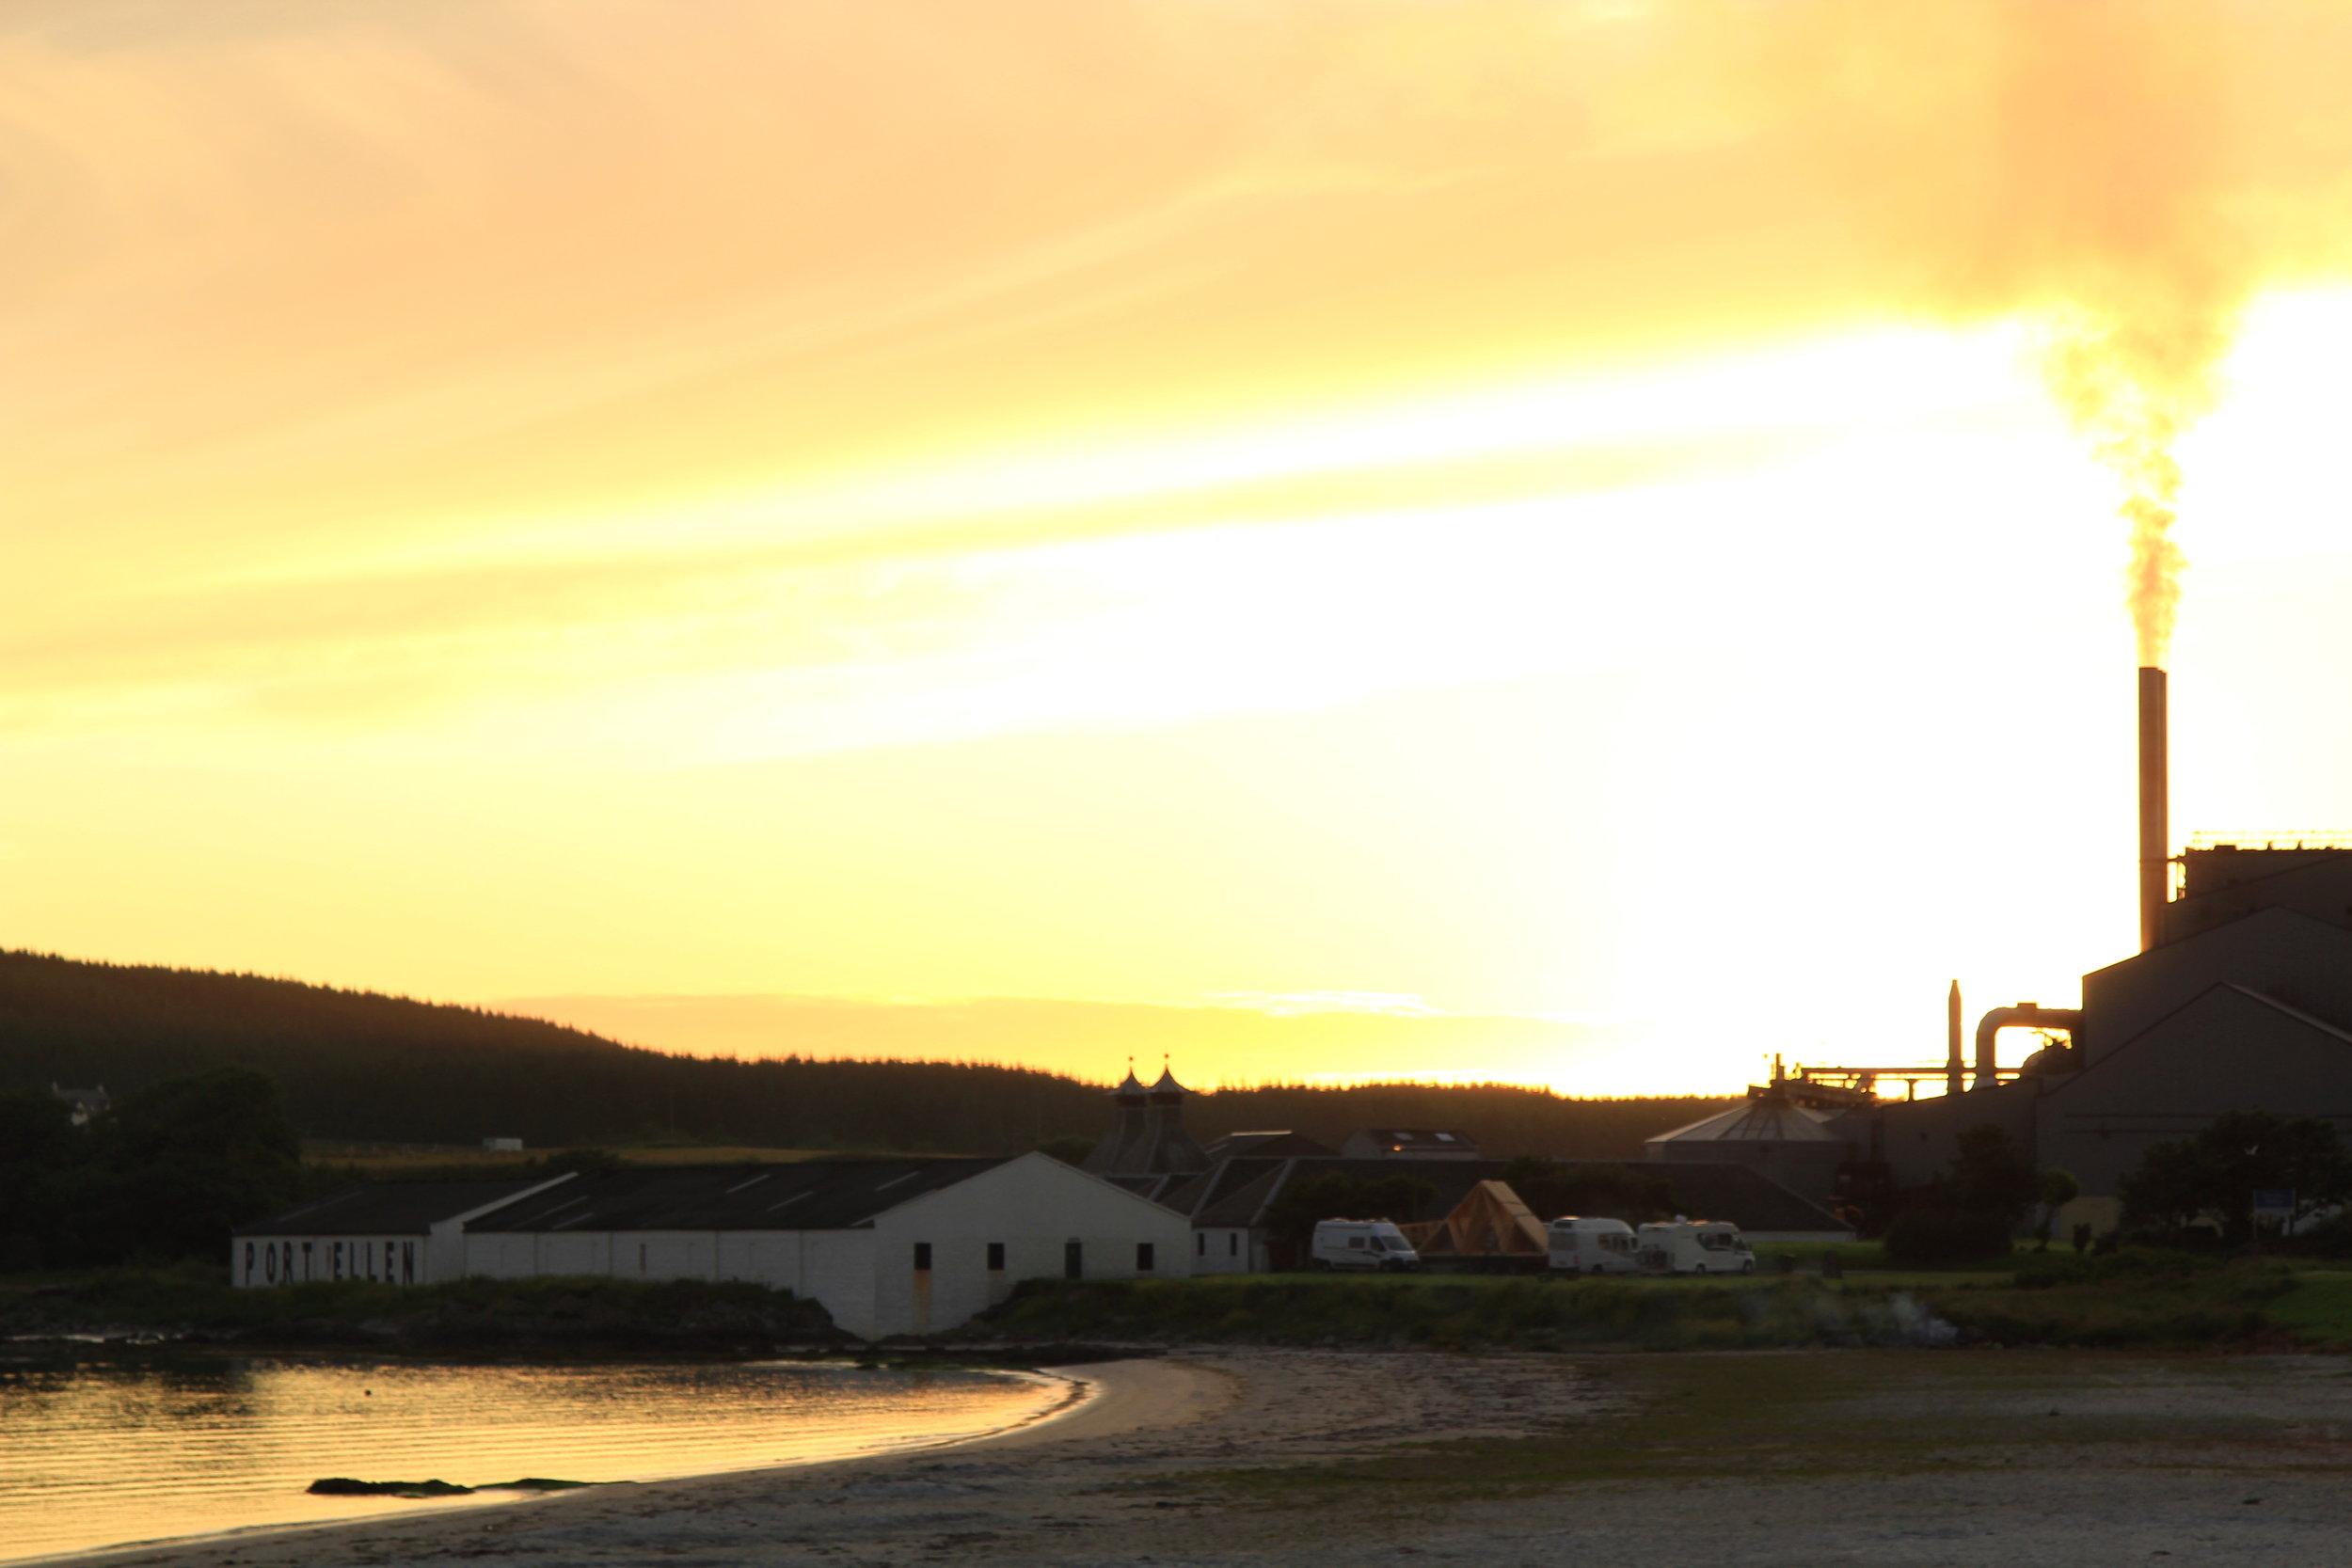 sunset in port ellen